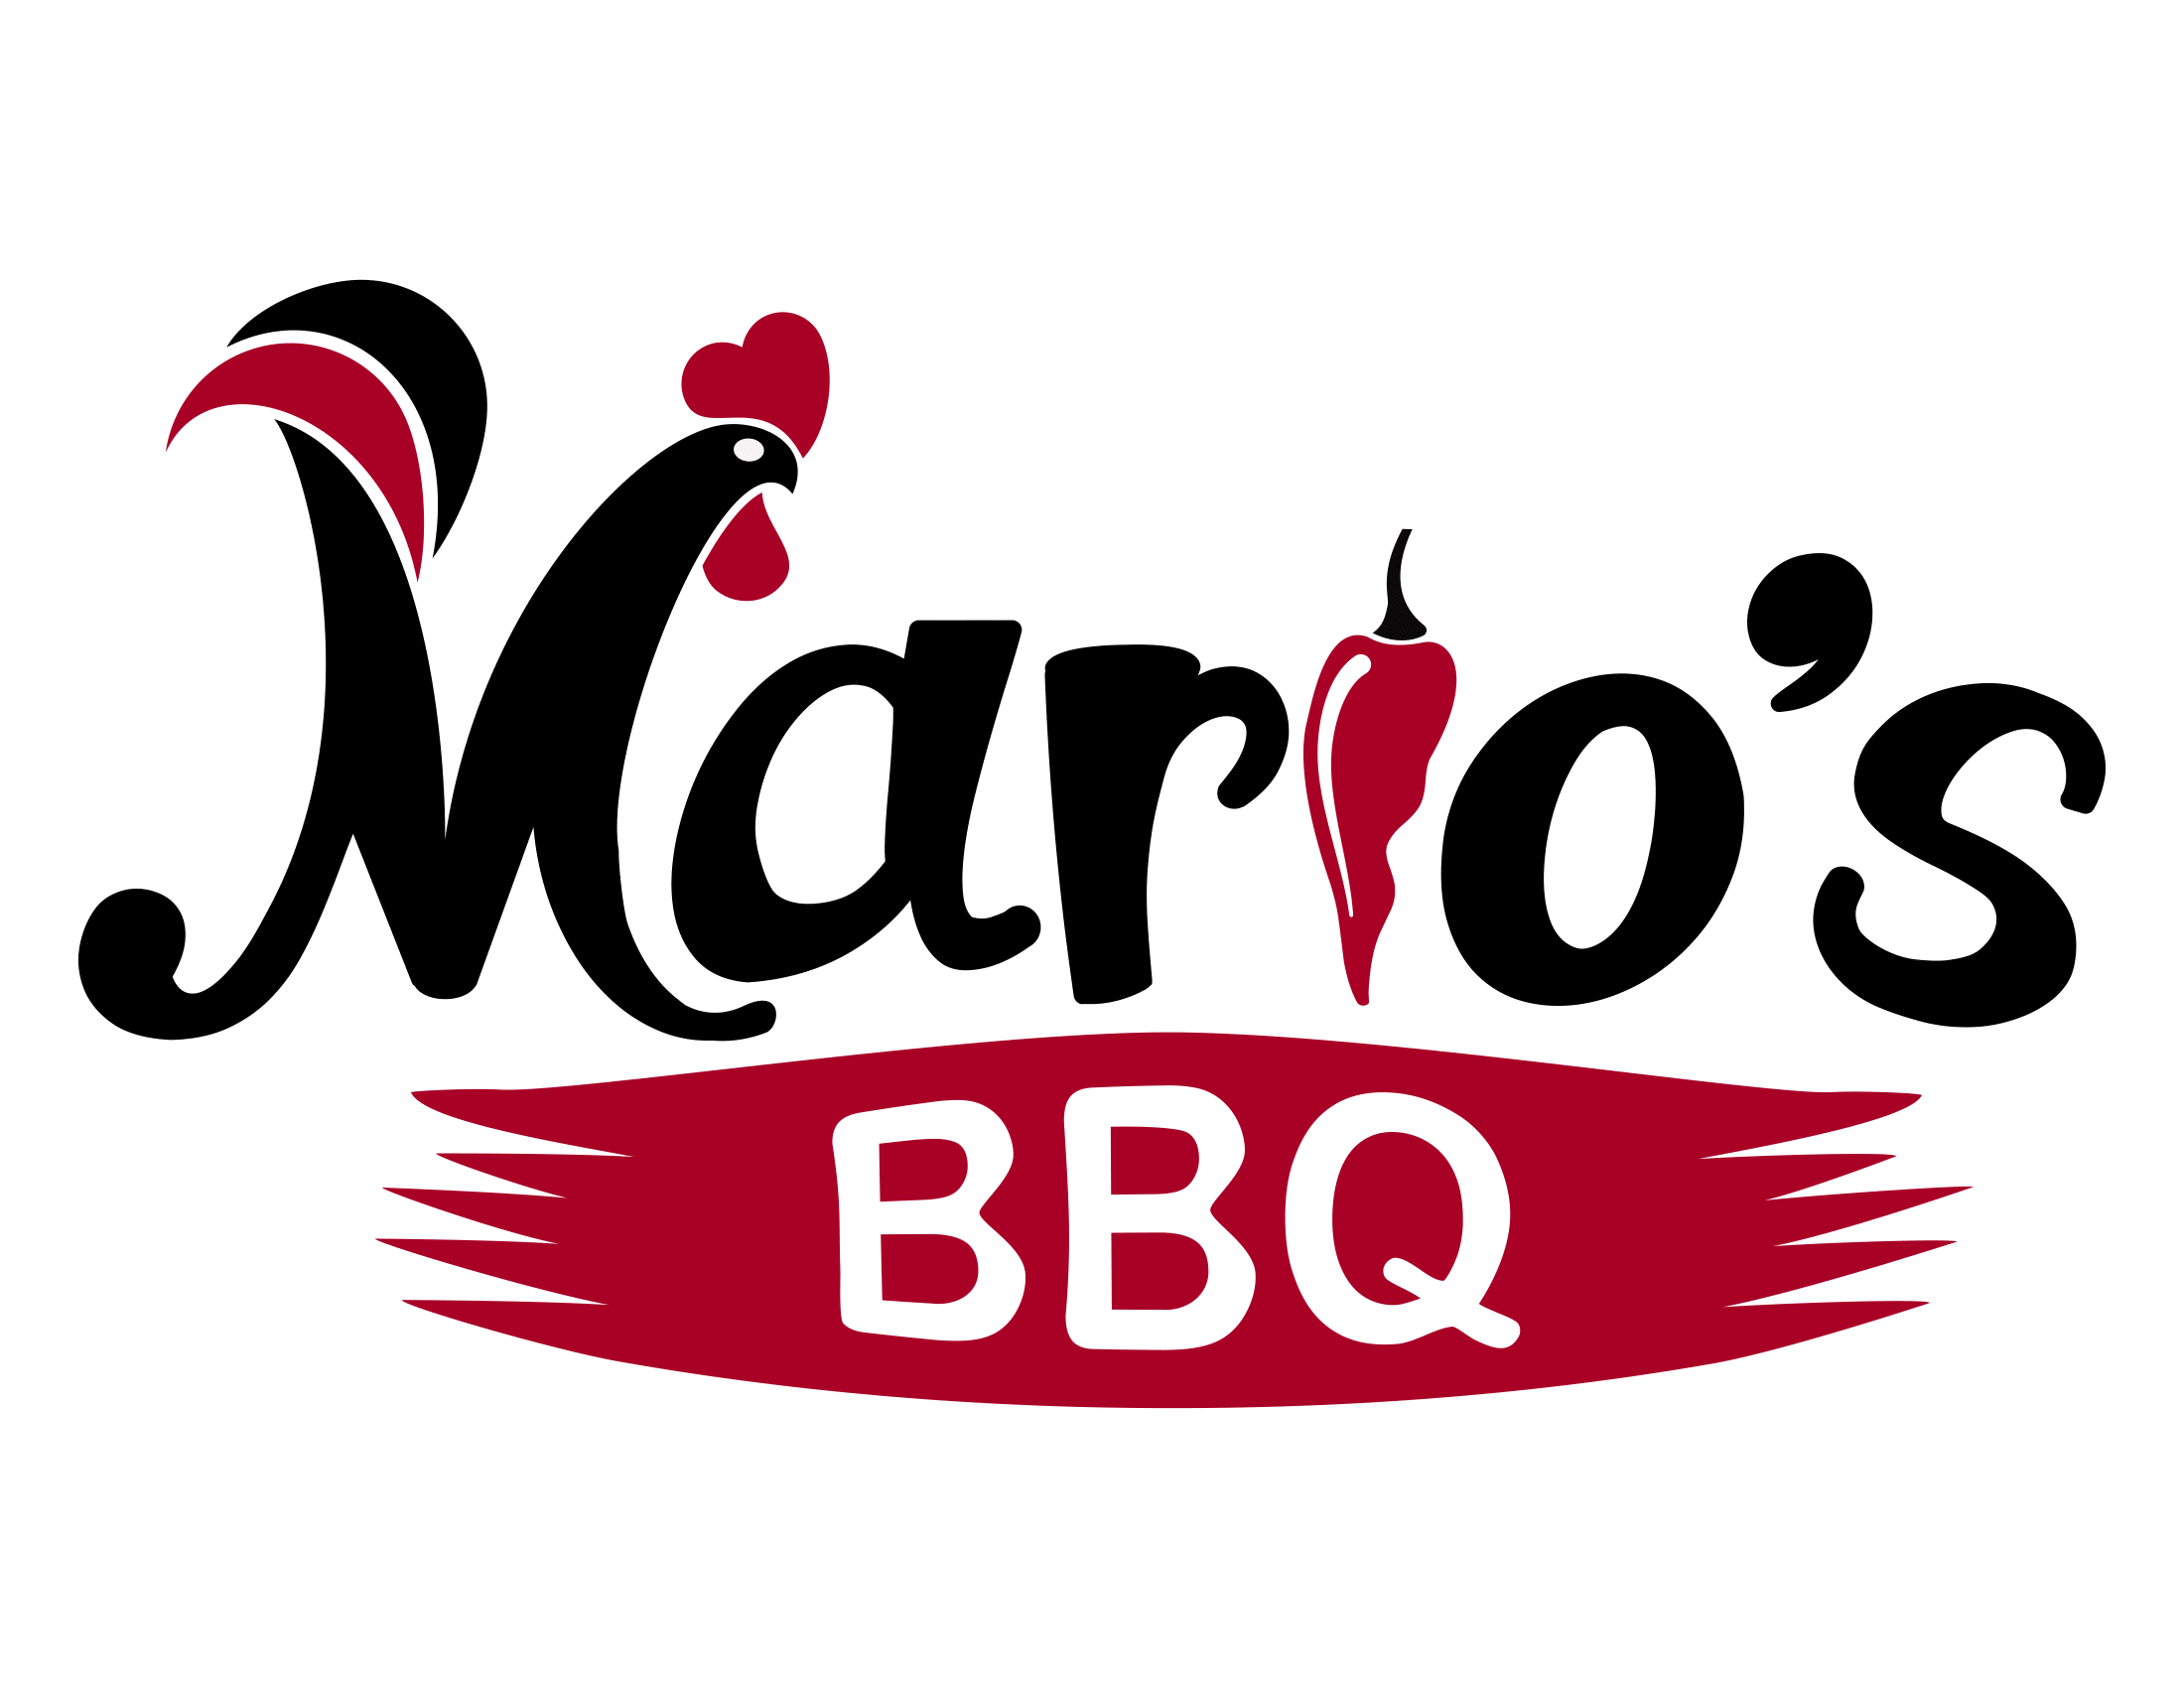 Mario's BBG